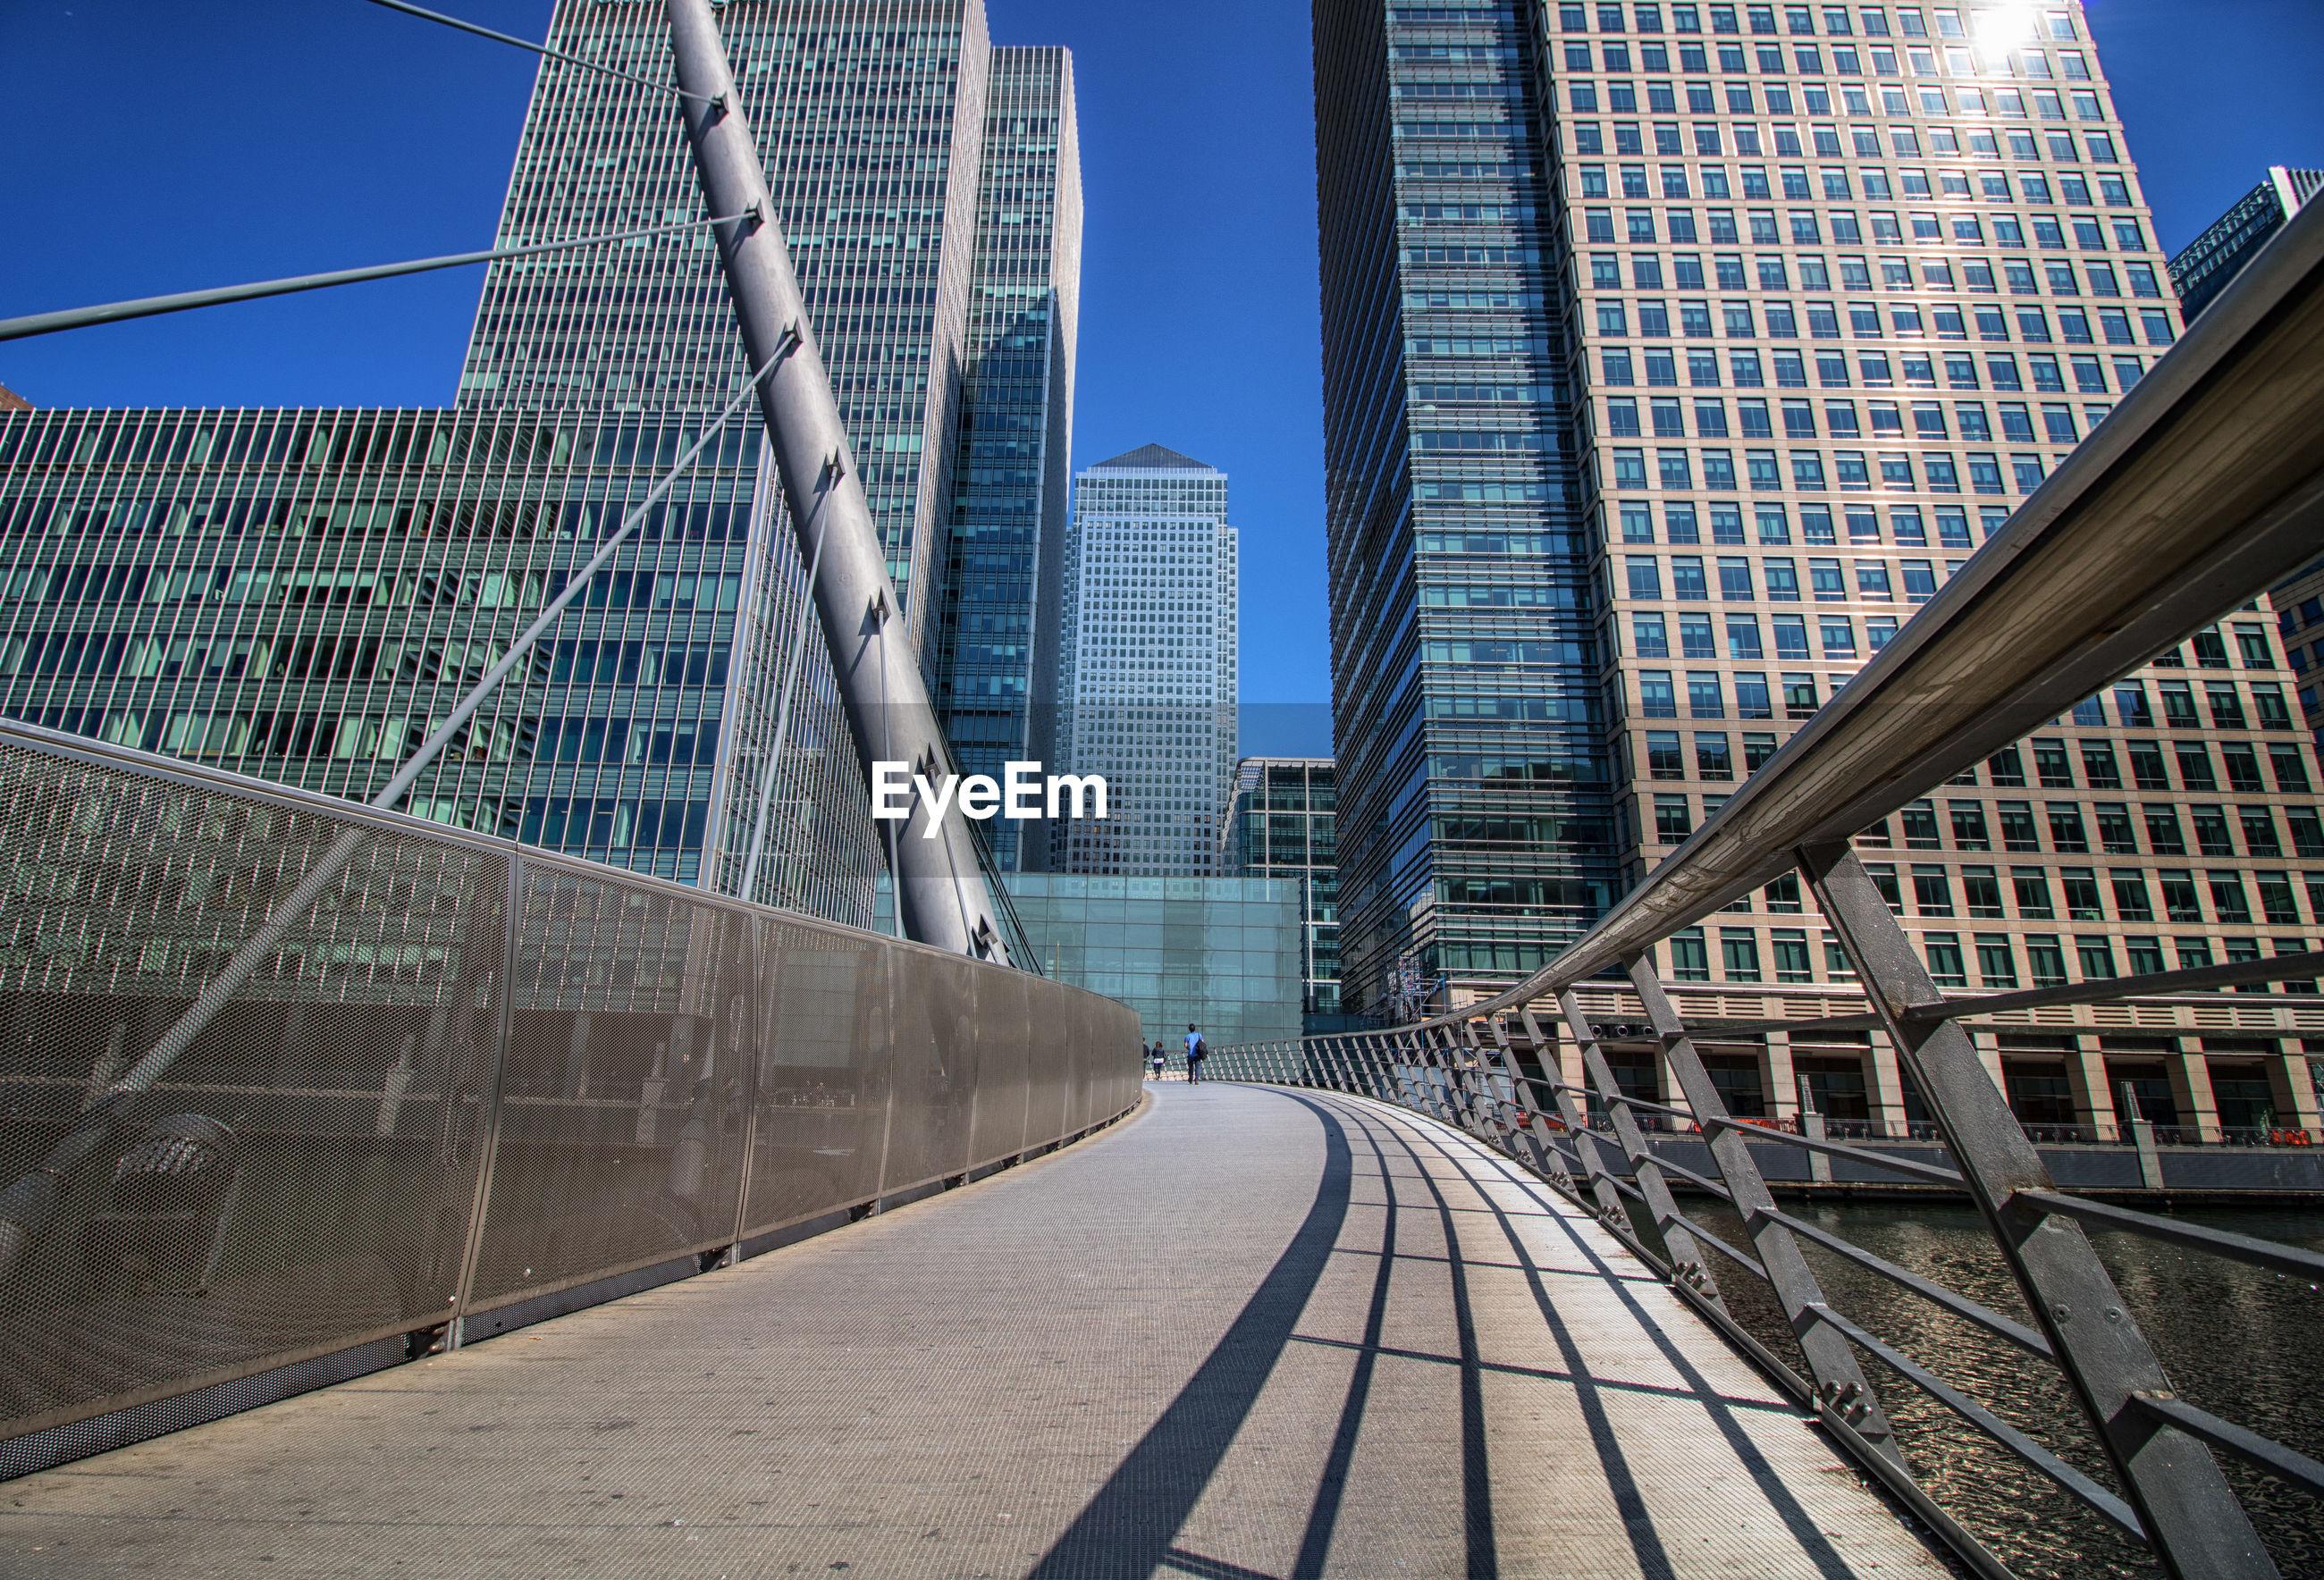 MODERN BRIDGE IN CITY AGAINST CLEAR SKY